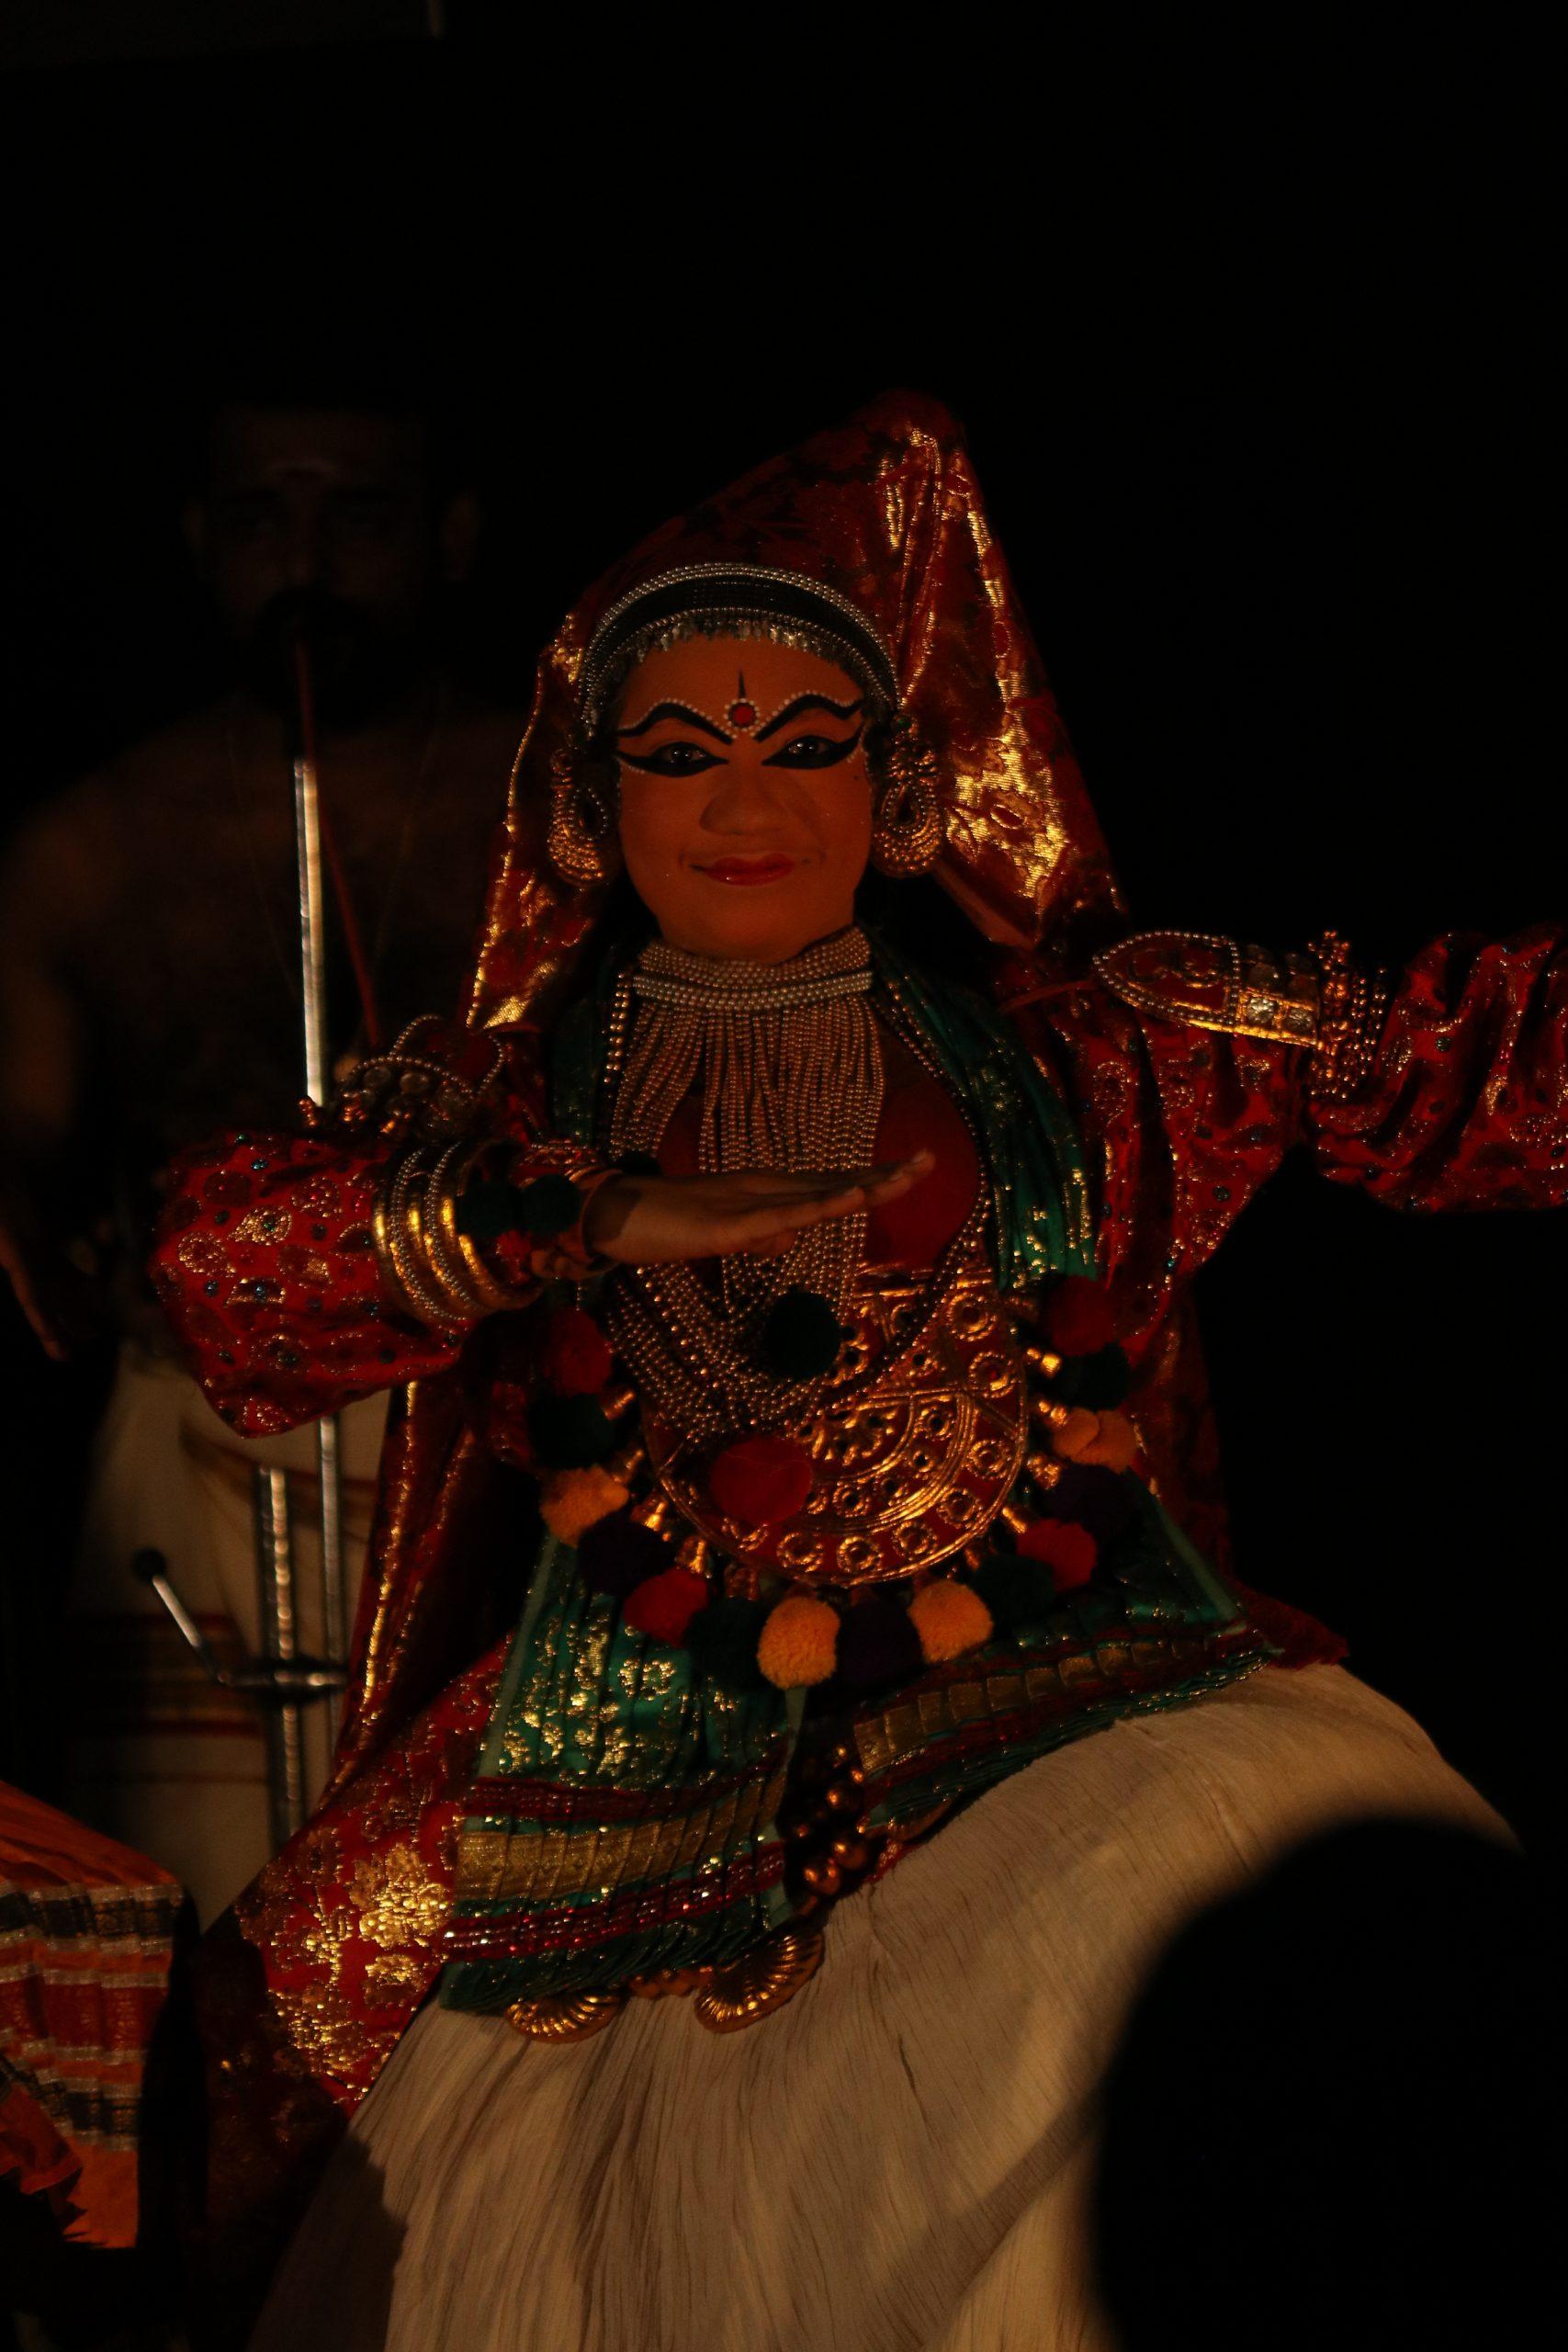 Portrait of a female kathakali artist